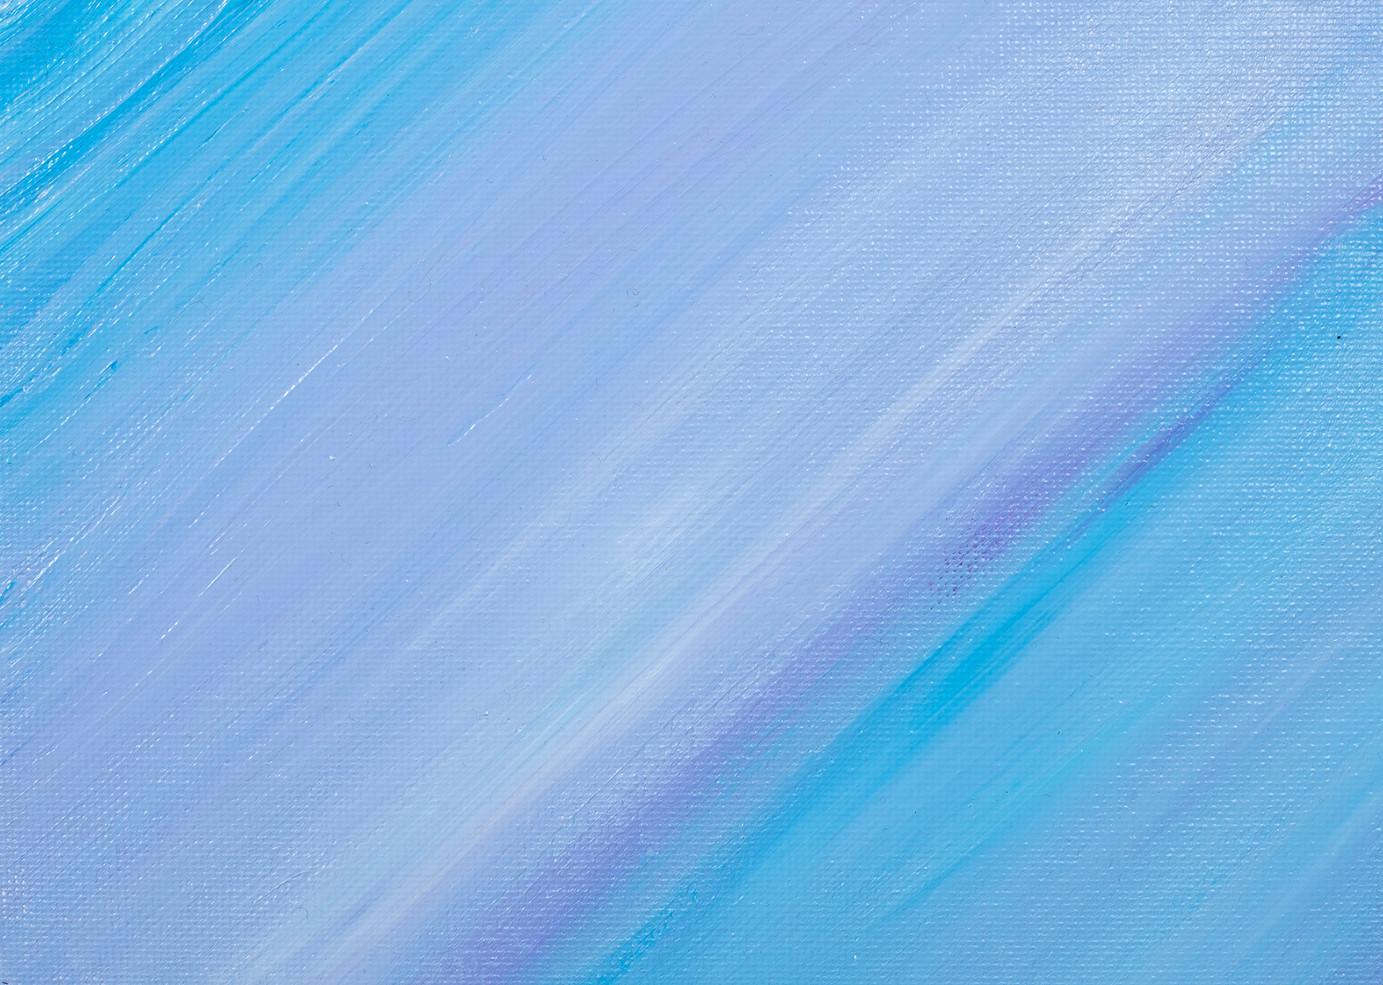 painting074.jpg